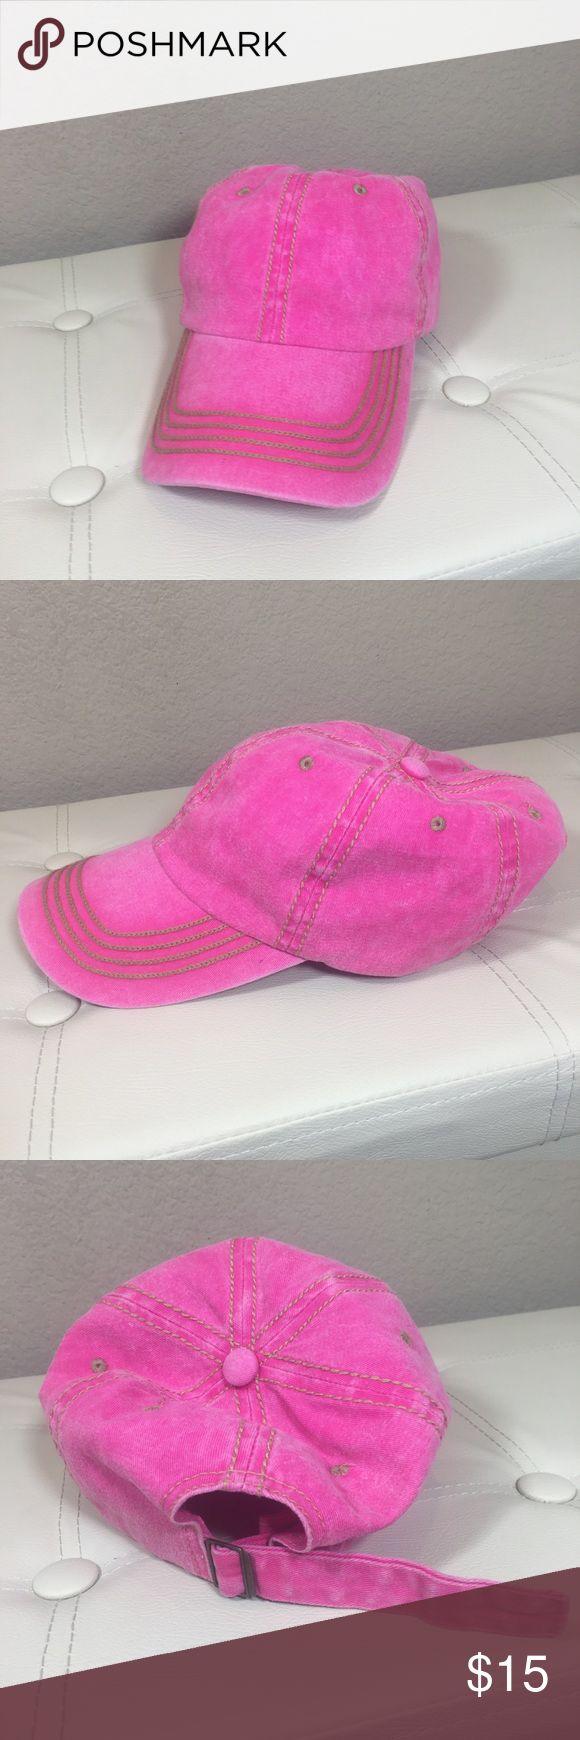 (Miroco) Hot Pink Baseball Cap-Excellent Condition Hot pink women's baseball cap. Adjustable back strap. Brand is miroco. No trades  -- PO DRAWER  #baseballcap #cap #hat Accessories Hats